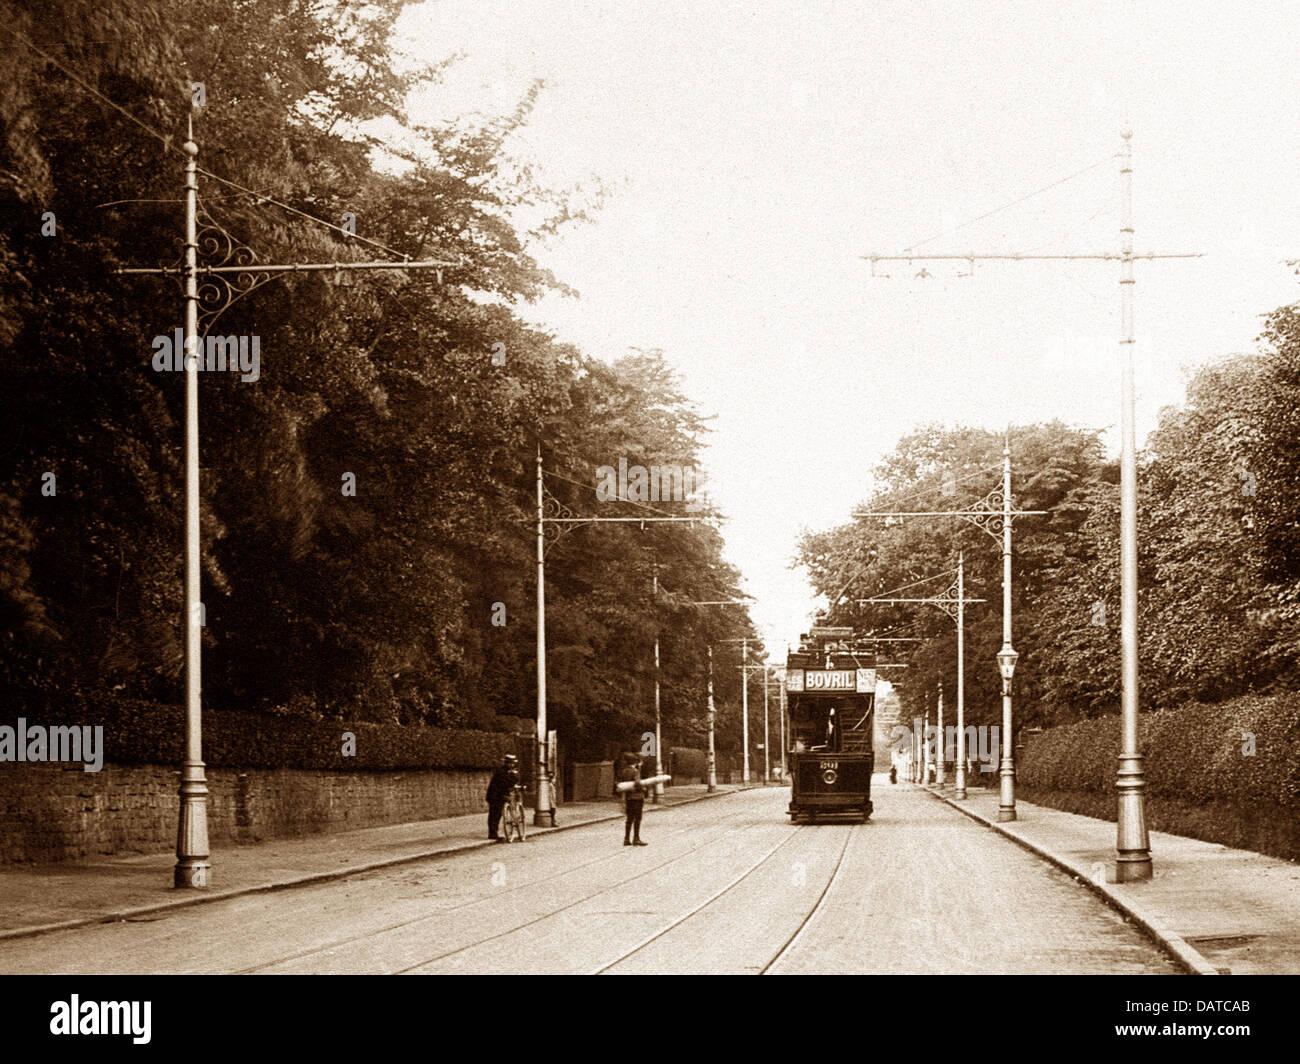 Erdington Sutton Road Birmingham early 1900s - Stock Image